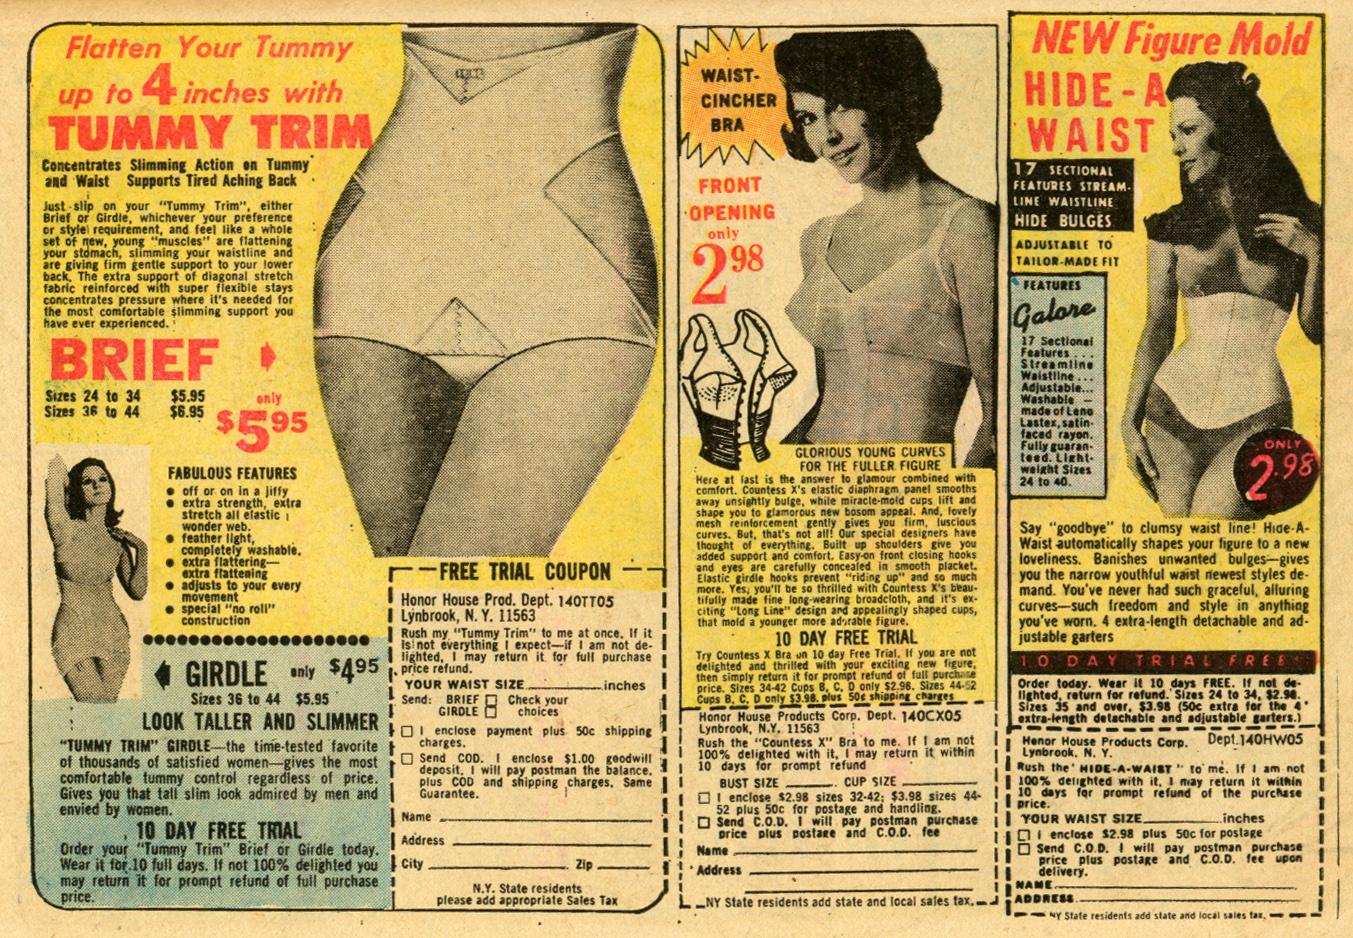 Vintage romance comic book advertisement Girdles